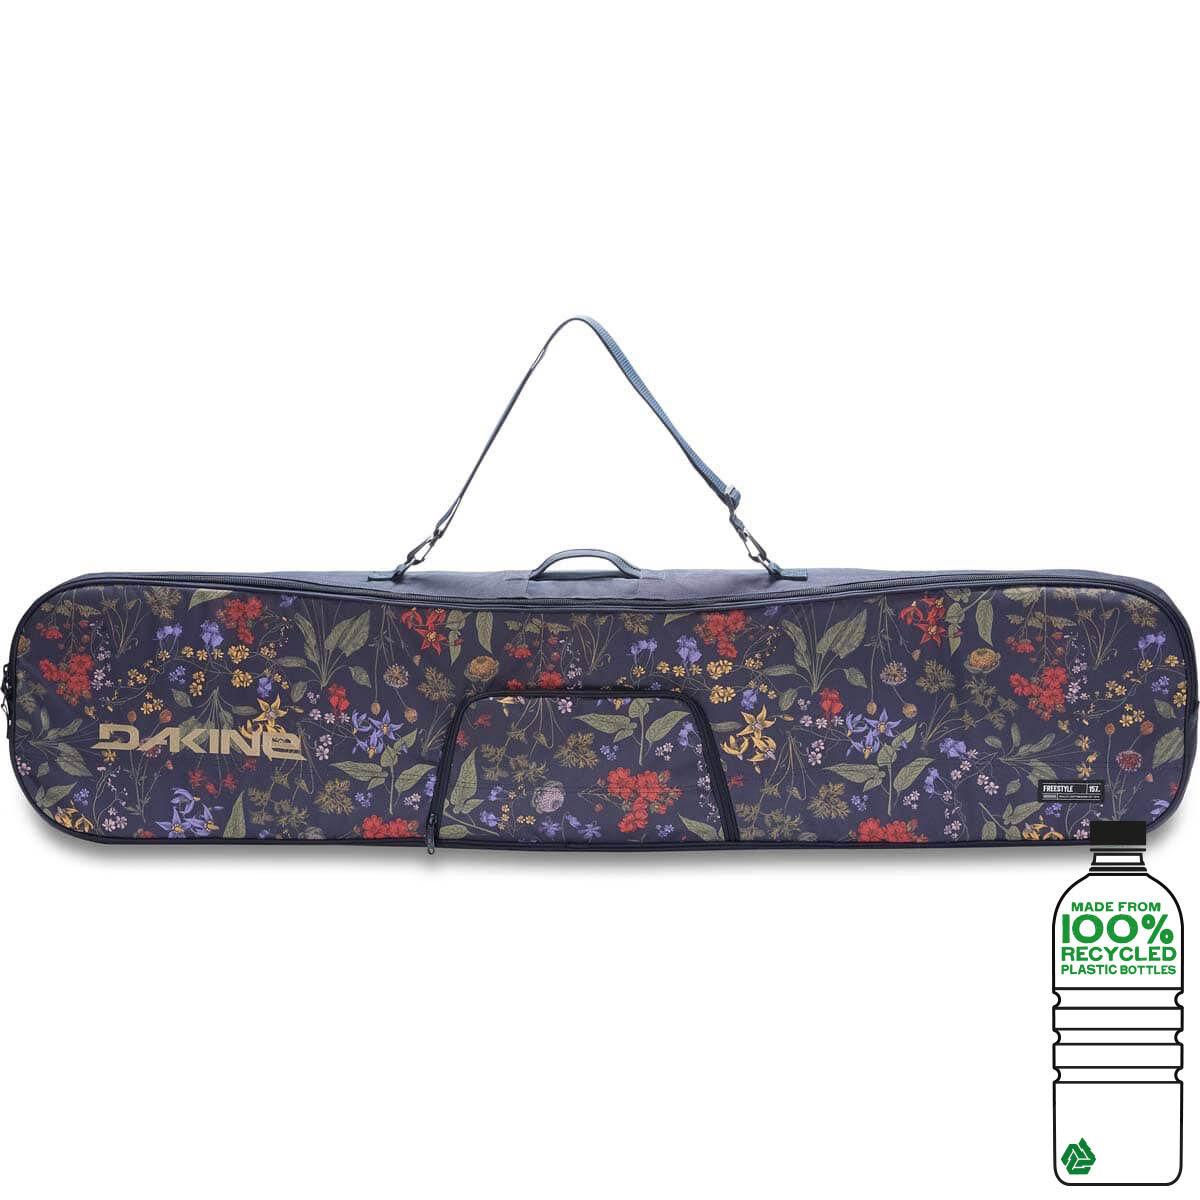 Dakine Freestyle Snowboard Bag 157 cm Snowboard Boardbag Botanics Pet